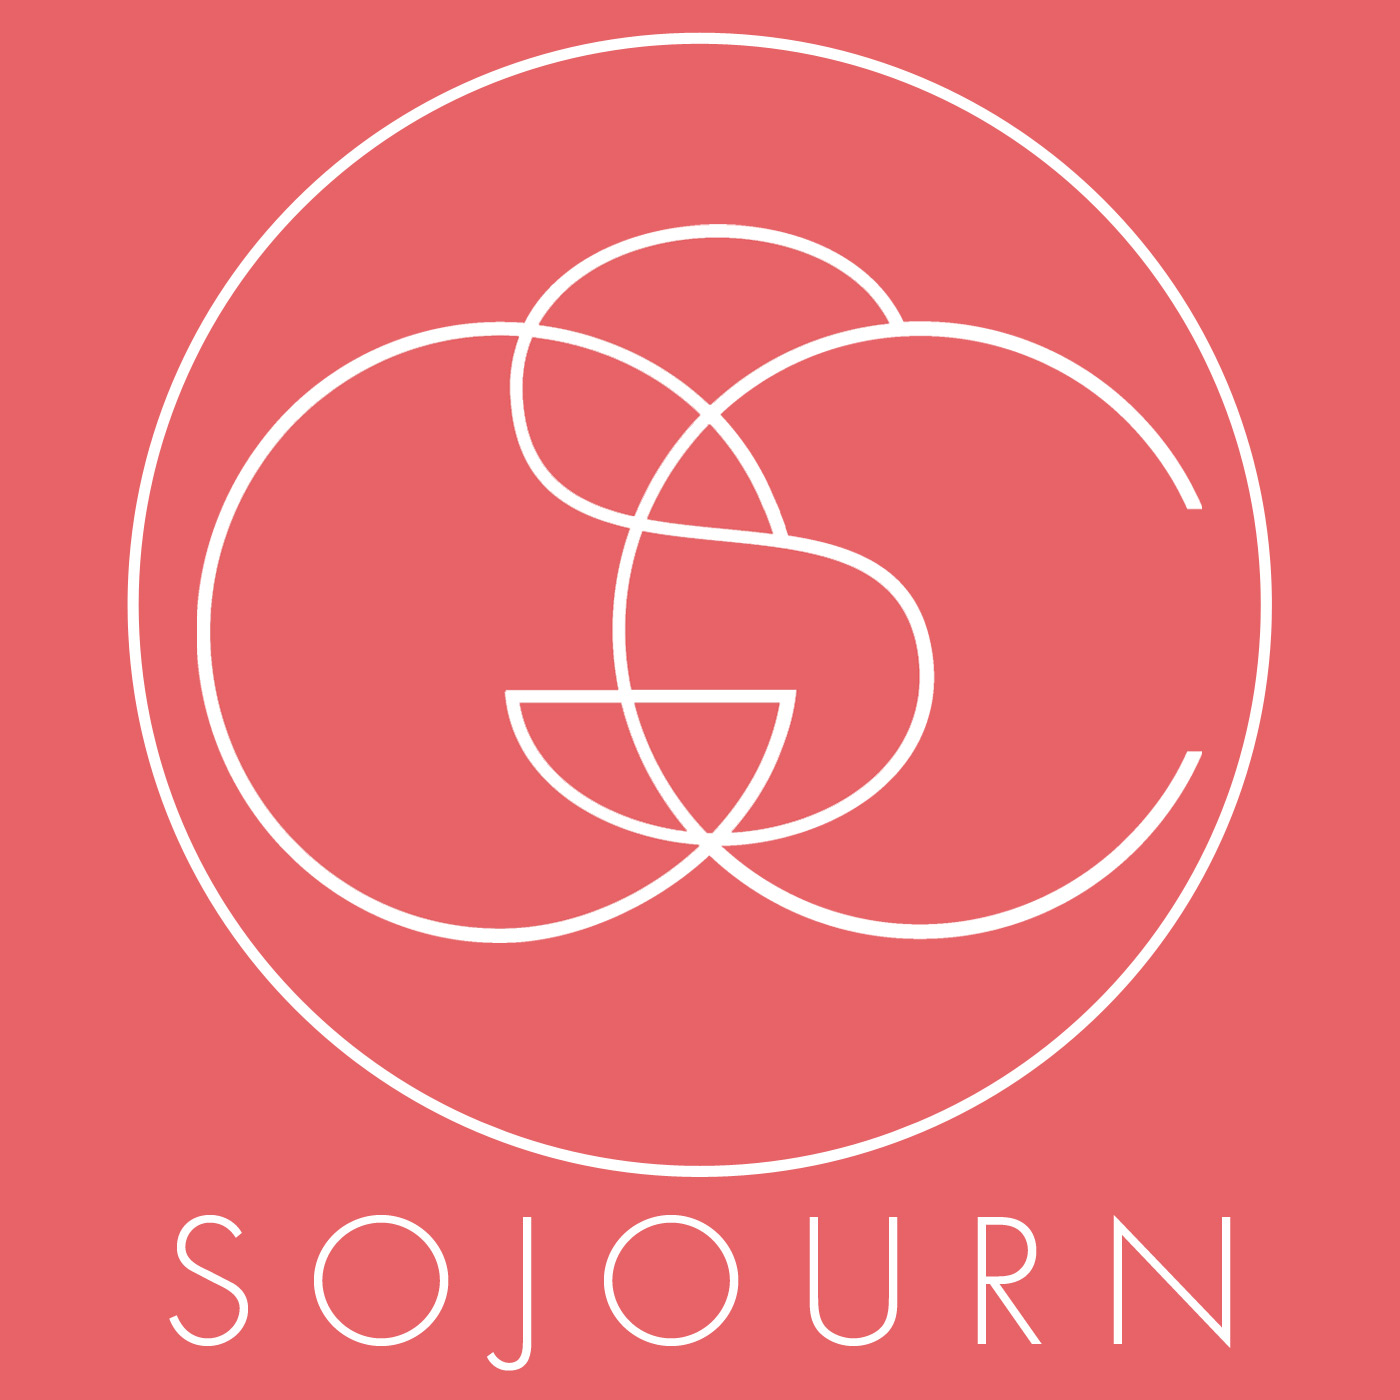 Sojourn Grace Collective - Sojourn Grace Collective